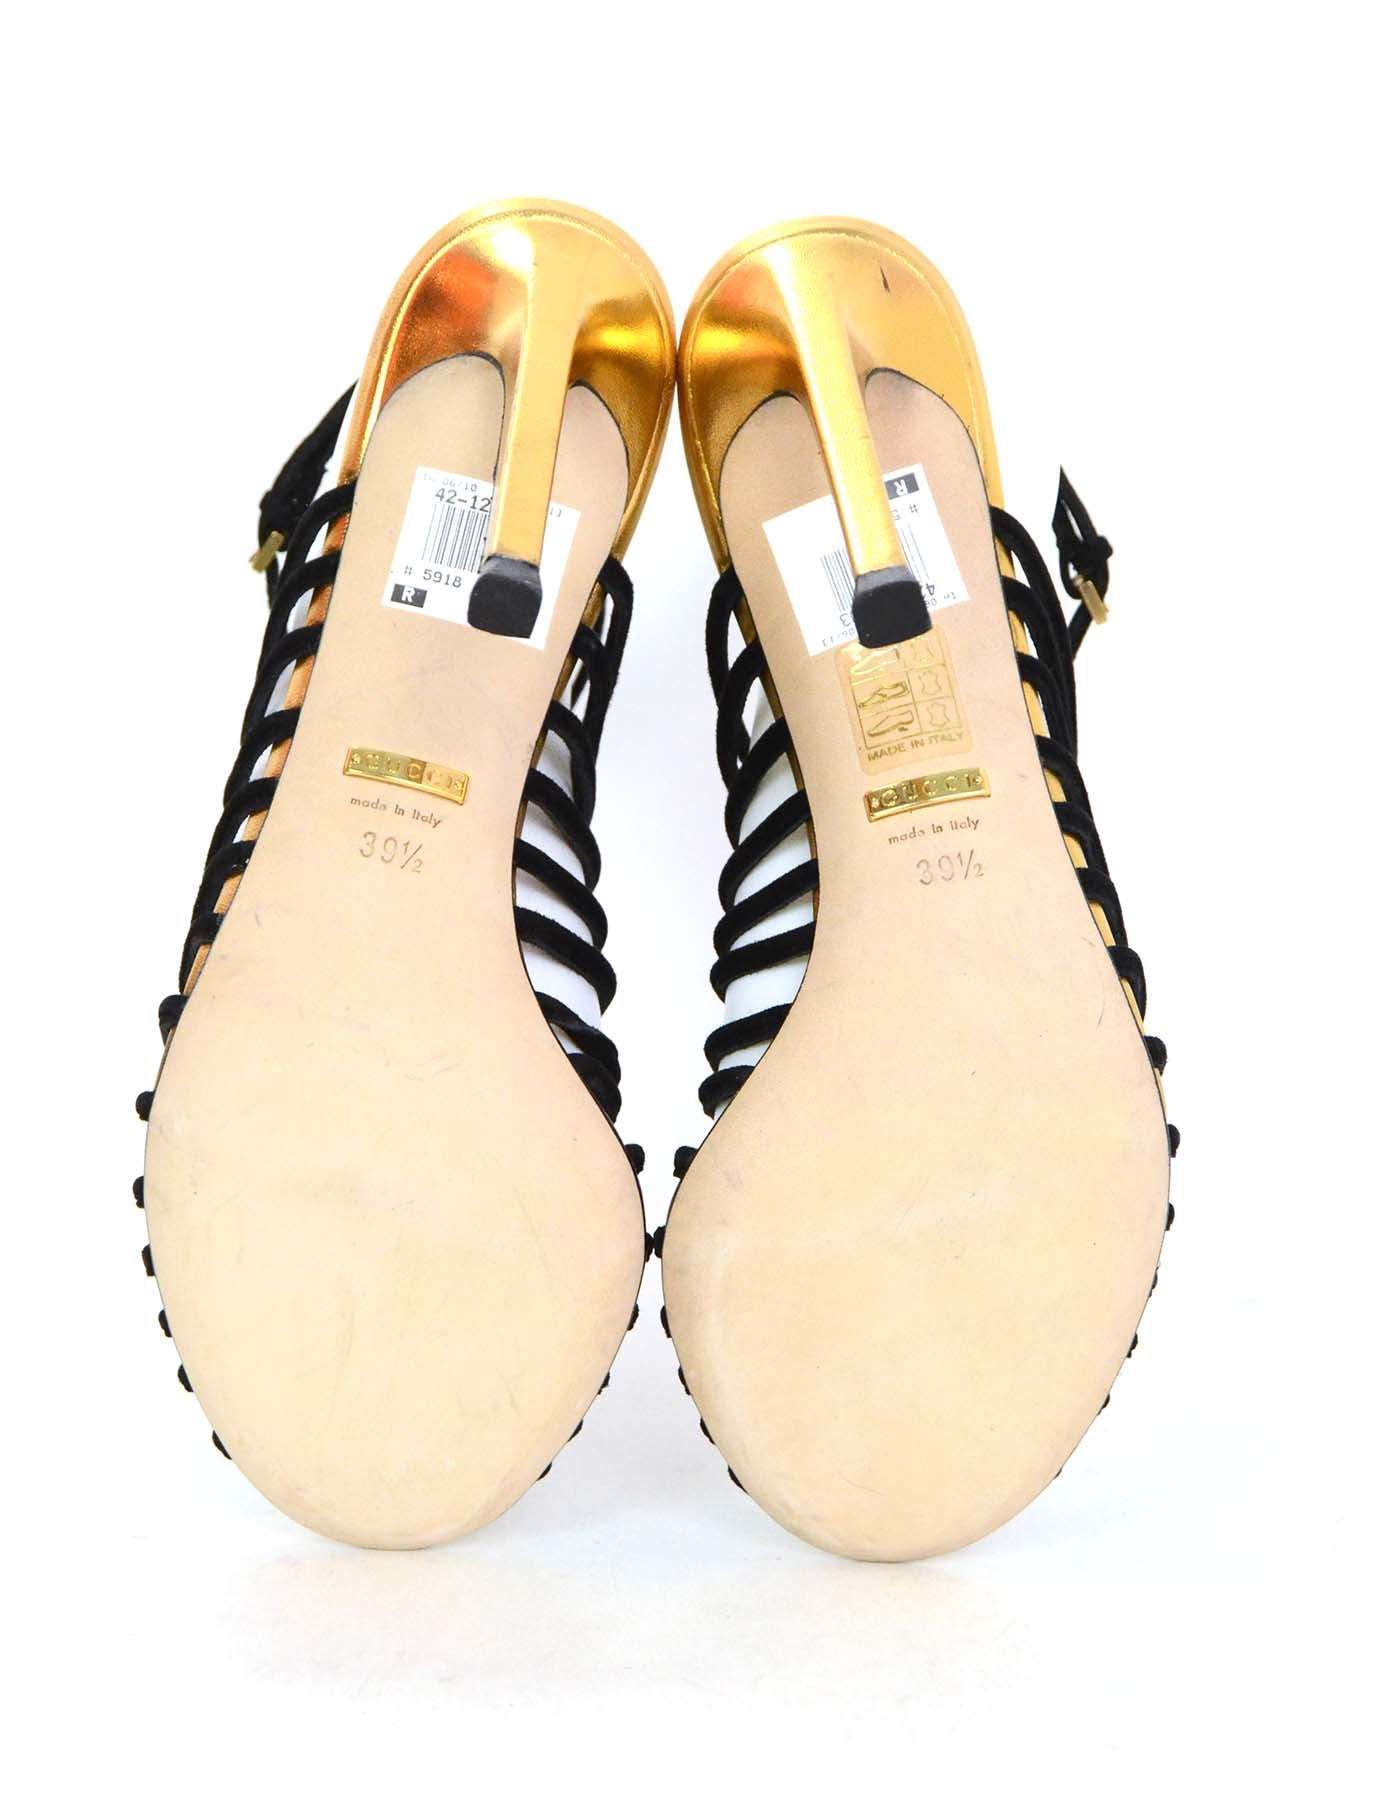 0806bcca512644 Gucci Black Suede Angelique Cage Sandals sz 39.5 For Sale at 1stdibs